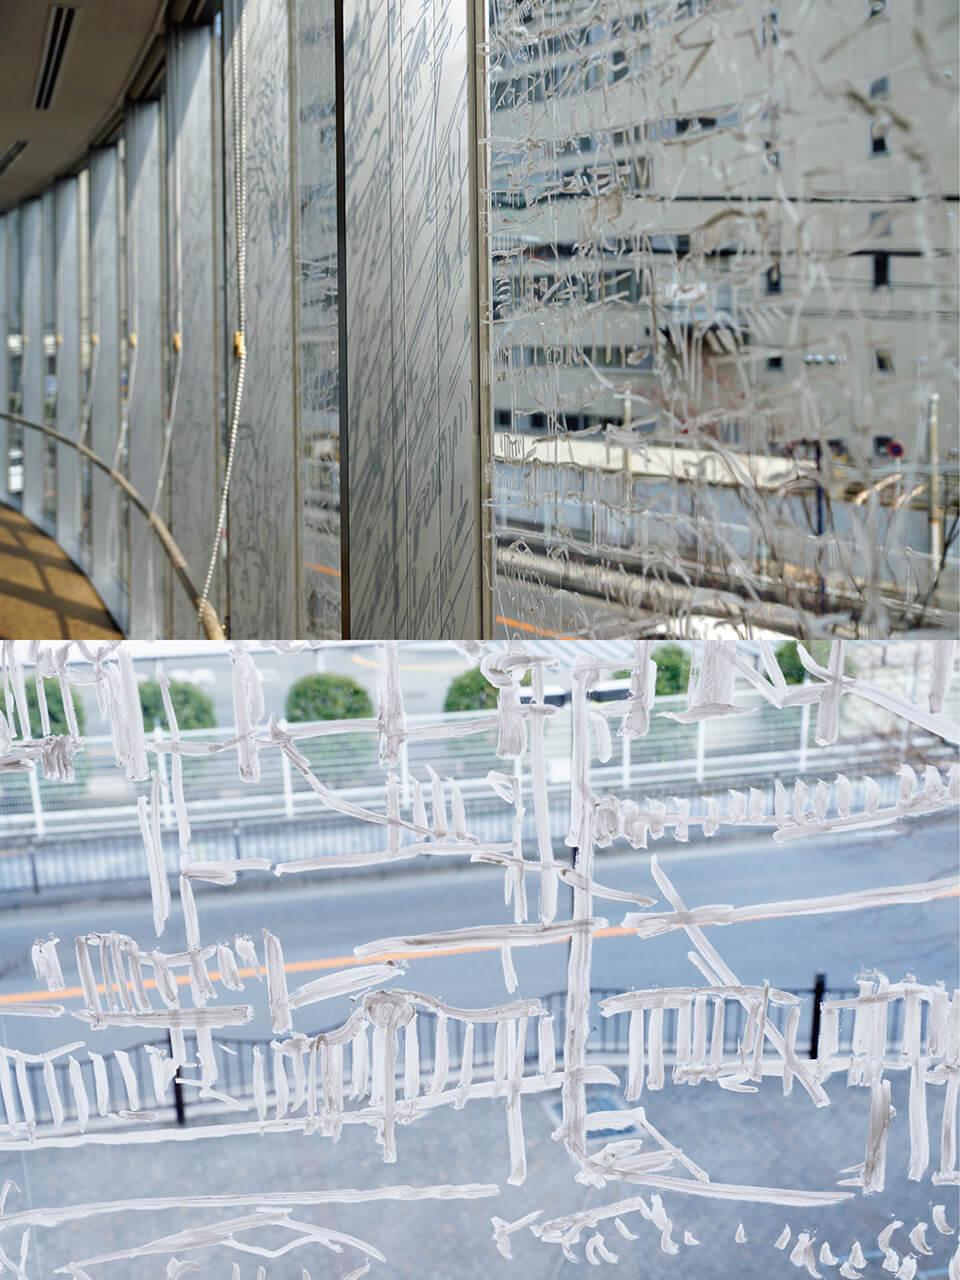 「BEYOND~コチラとムコウ in 茨木~ 」2014<br /> 2階吹き抜け 2500×450cm detail<br /> 施設内の4カ所、計20数枚の窓ガラスに直接ドローイング<br /> lacquer marker direct on window<br /> 茨木市立生涯学習センターきらめき/大阪